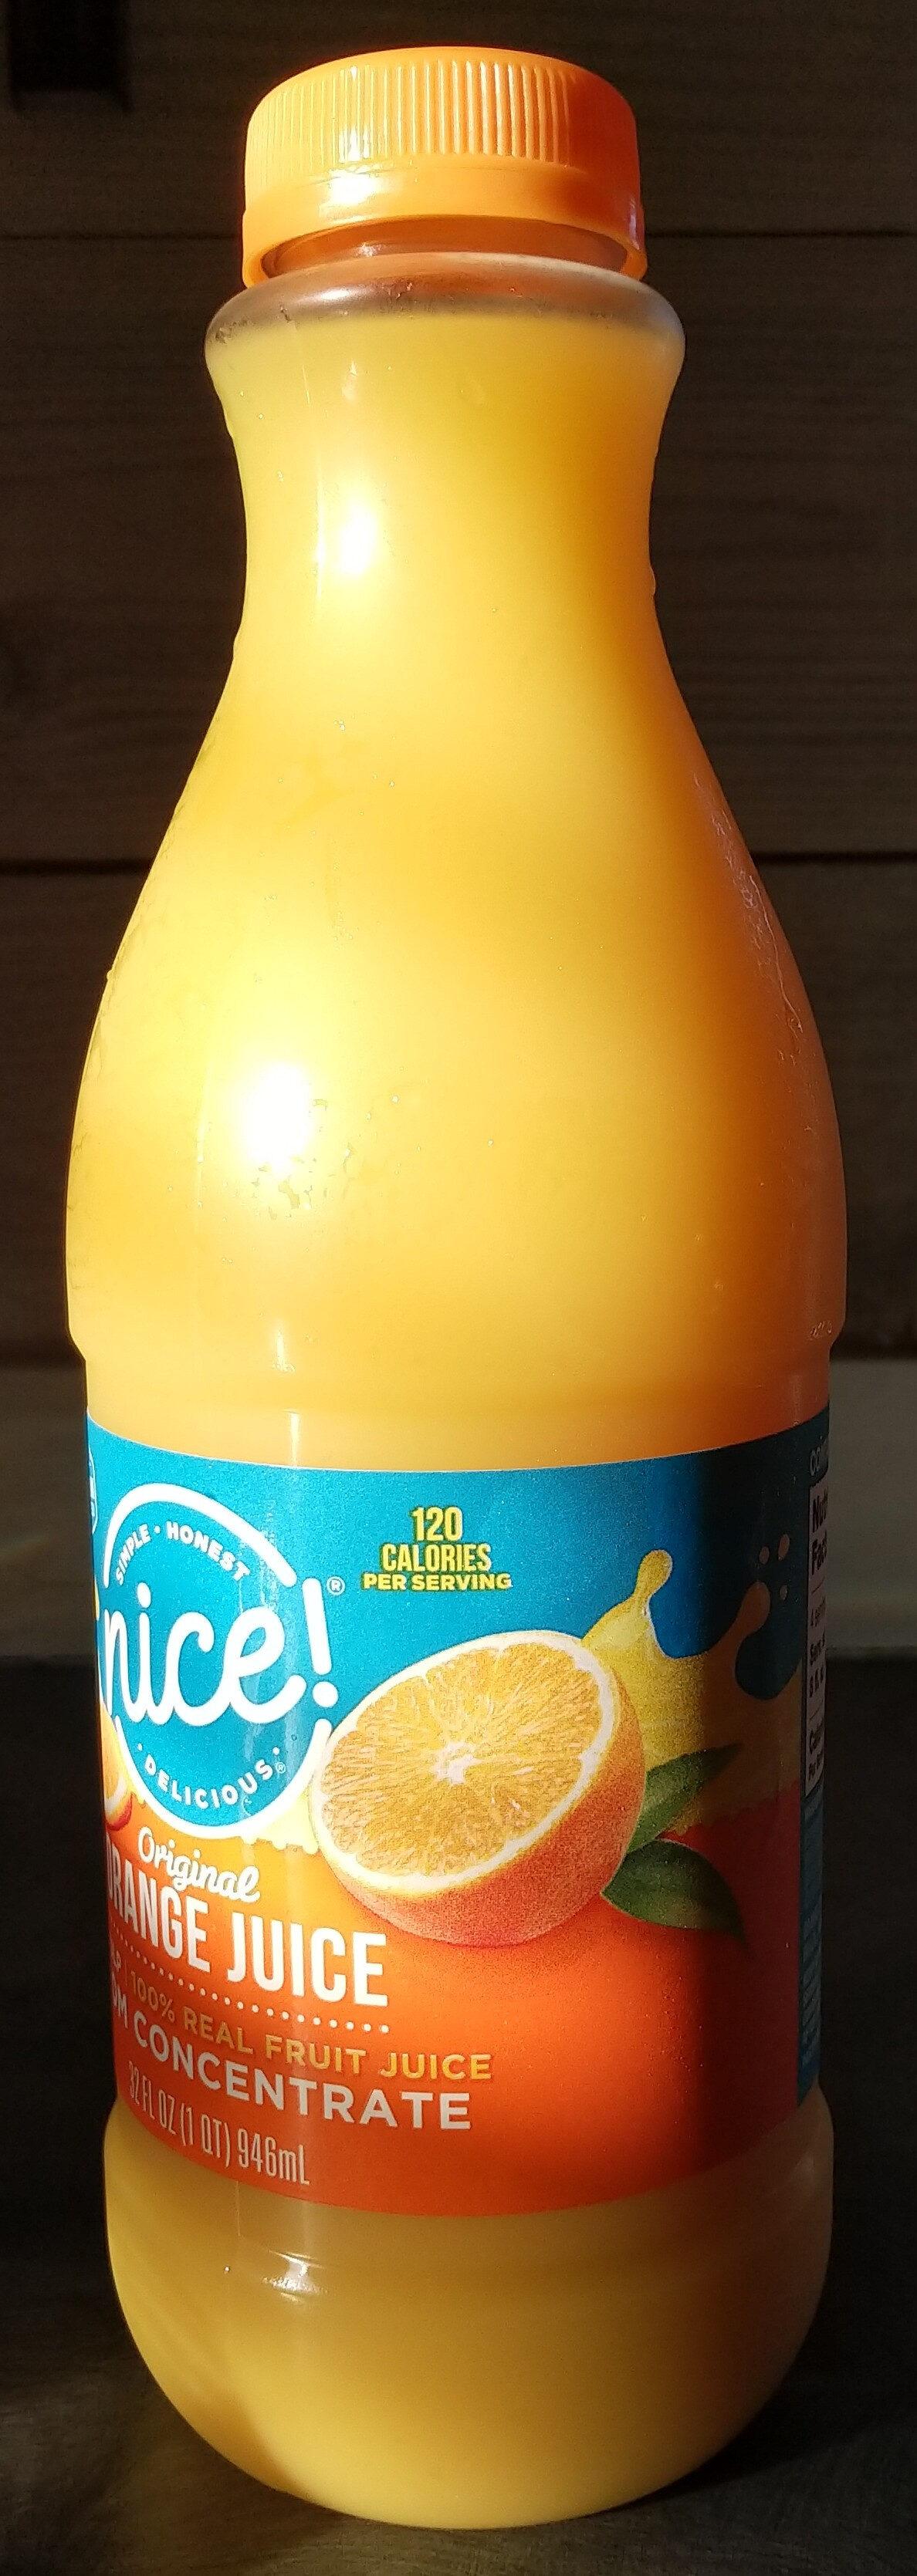 Original orange juice - Product - en